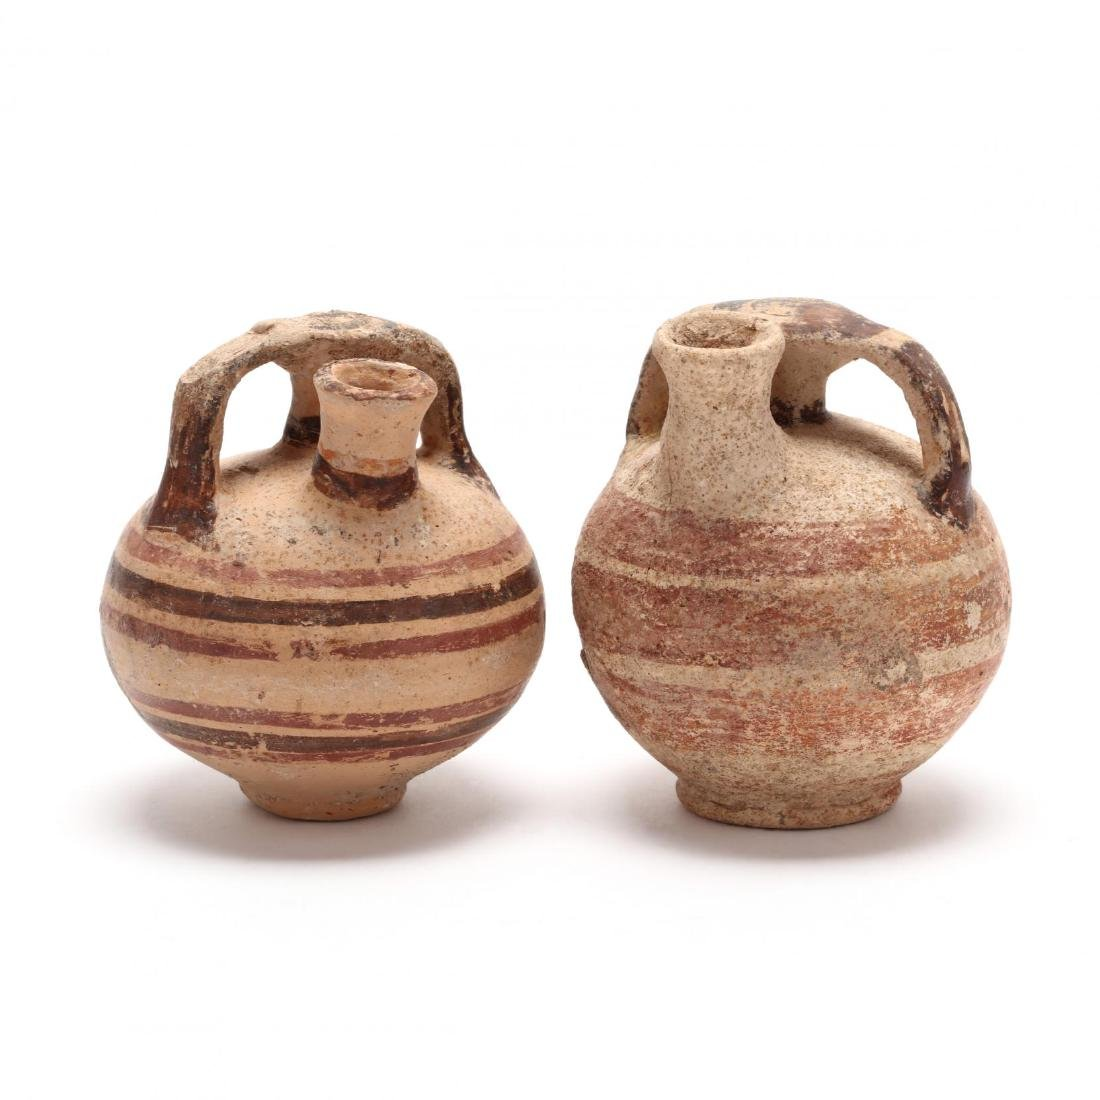 Two Cypriot-Mycenaean Stirrup Juglets